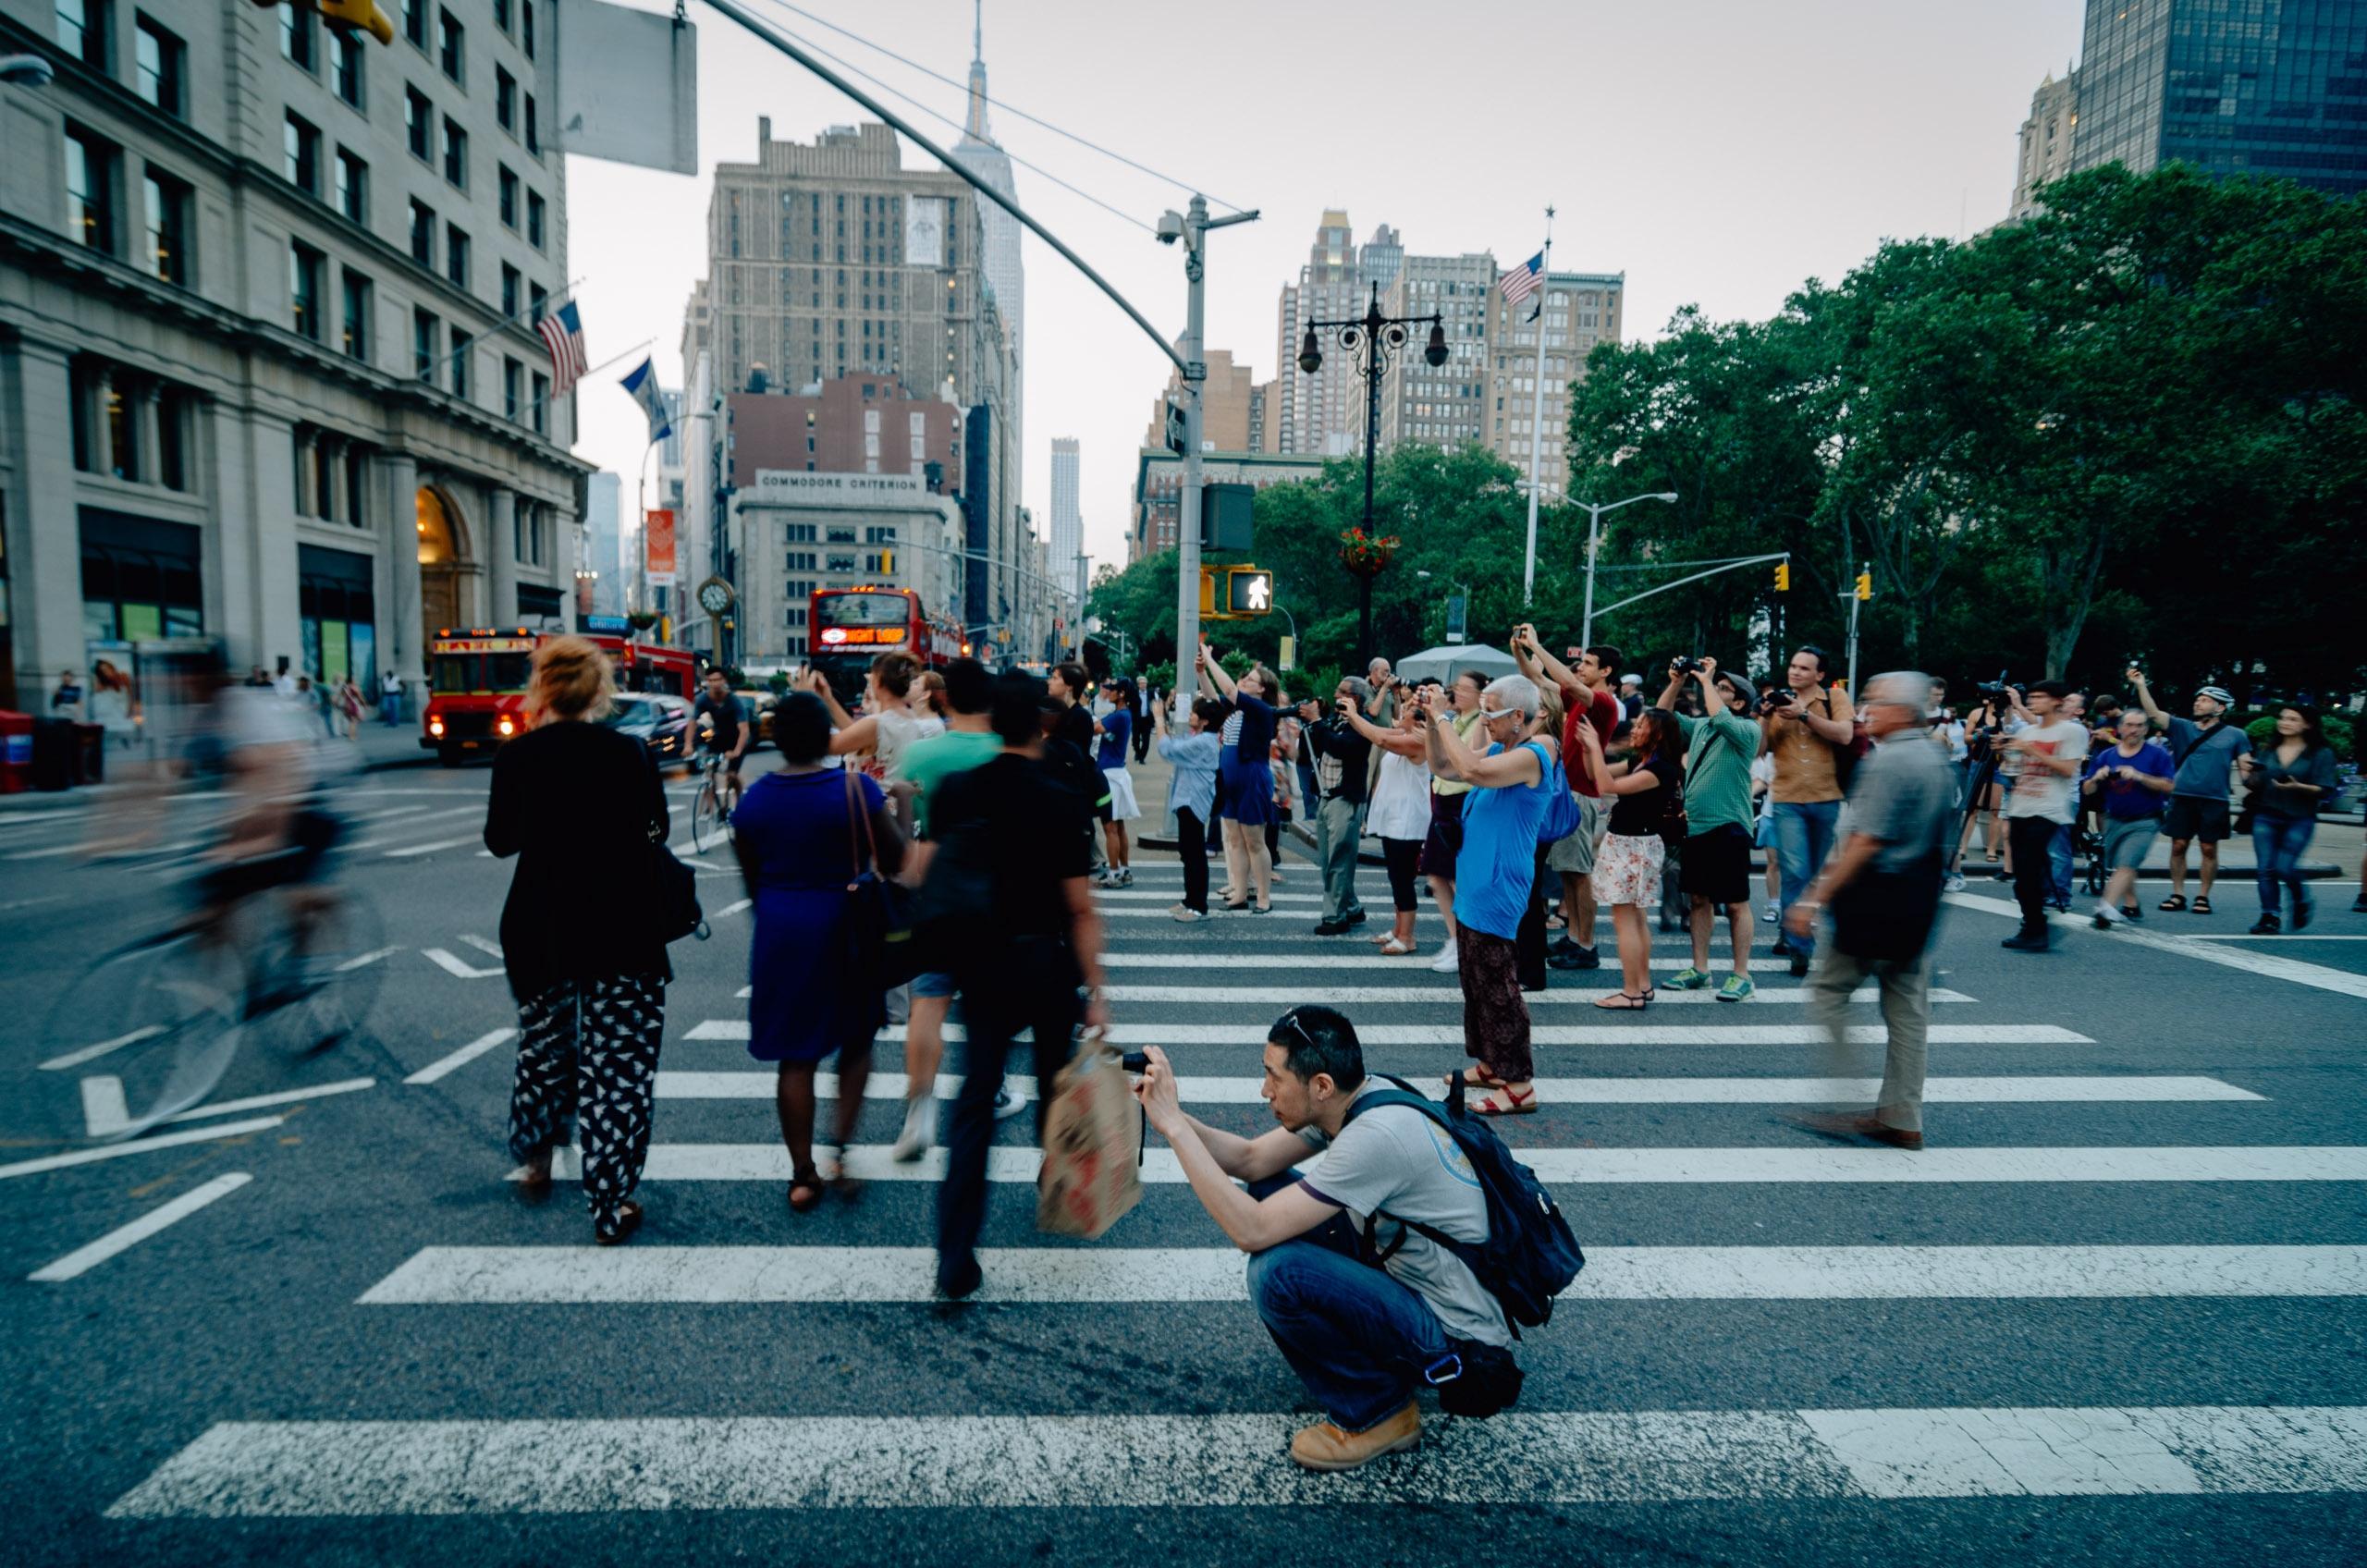 ManhattanHenge - 2011-0531-KPK_7498_107935